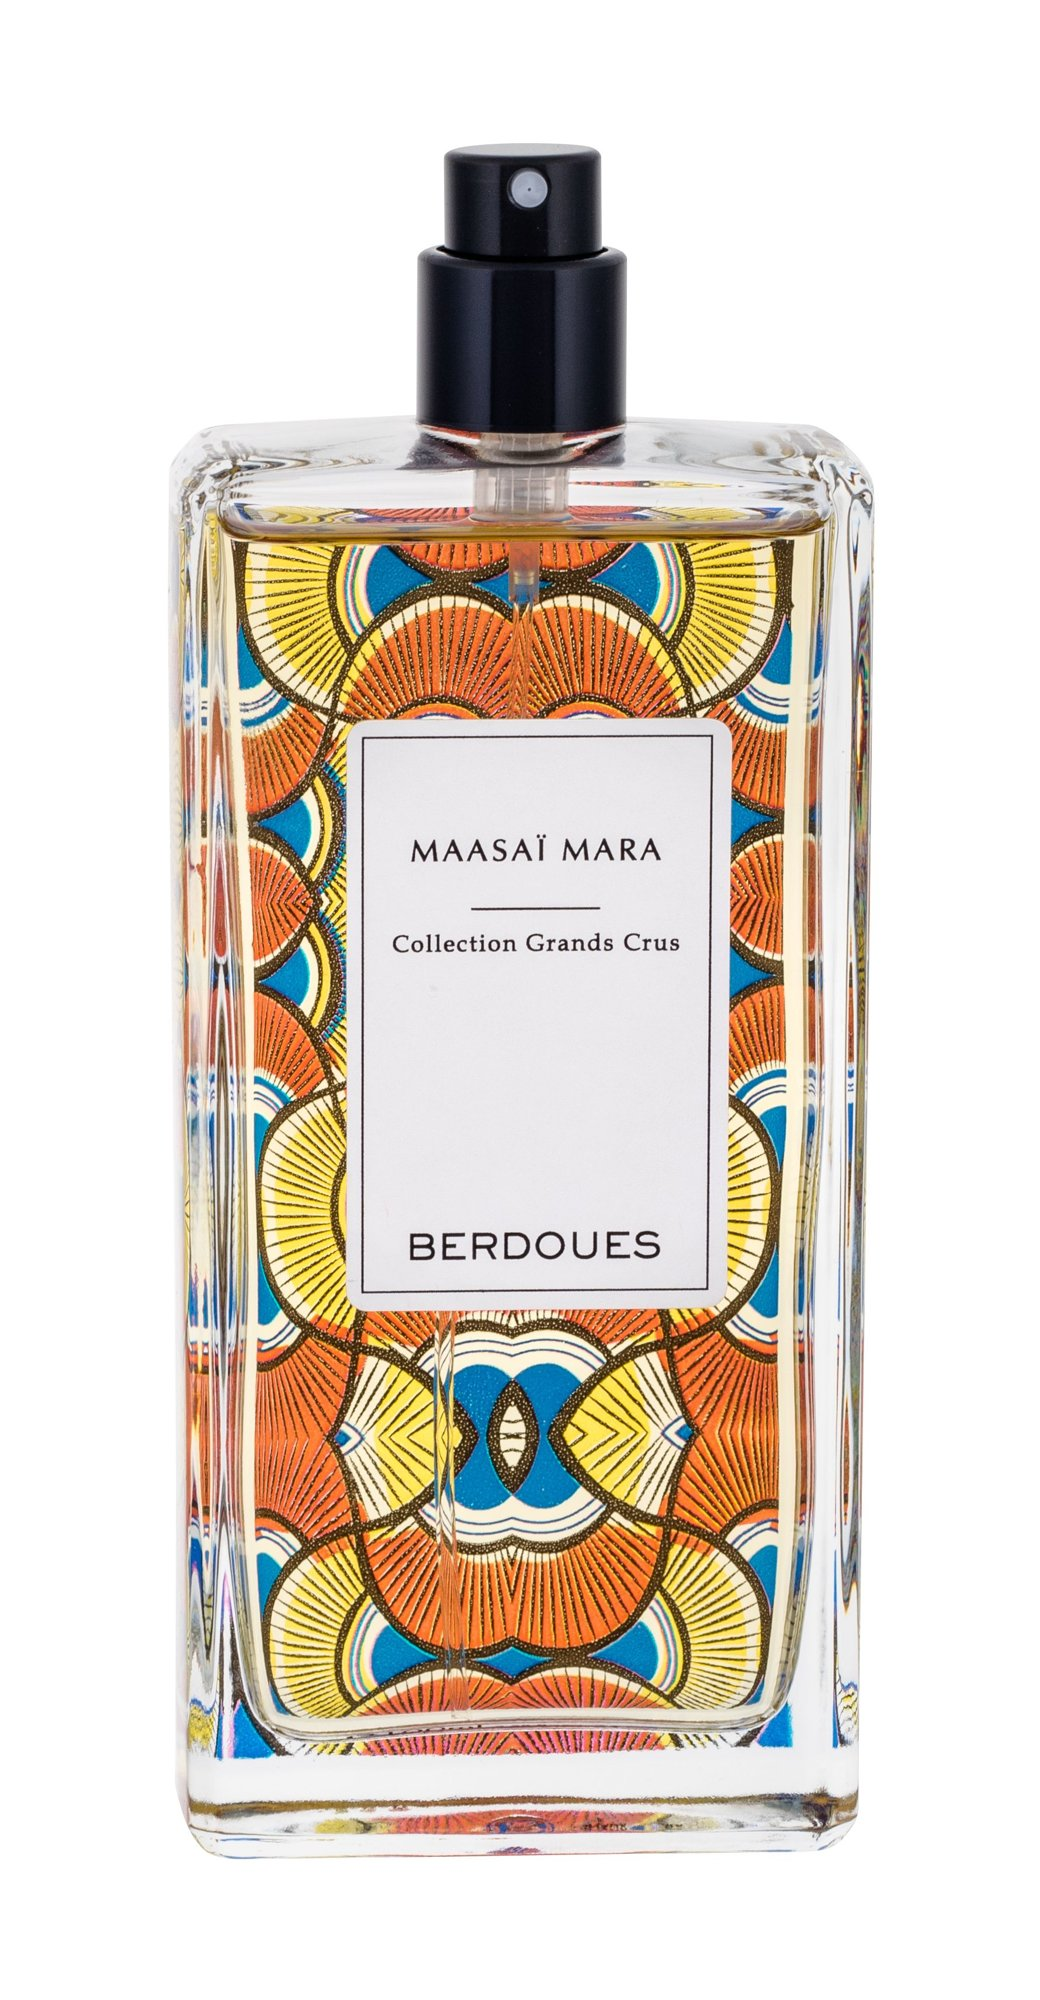 Berdoues Collection Grands Crus Eau de Parfum 100ml  Maasai Mara